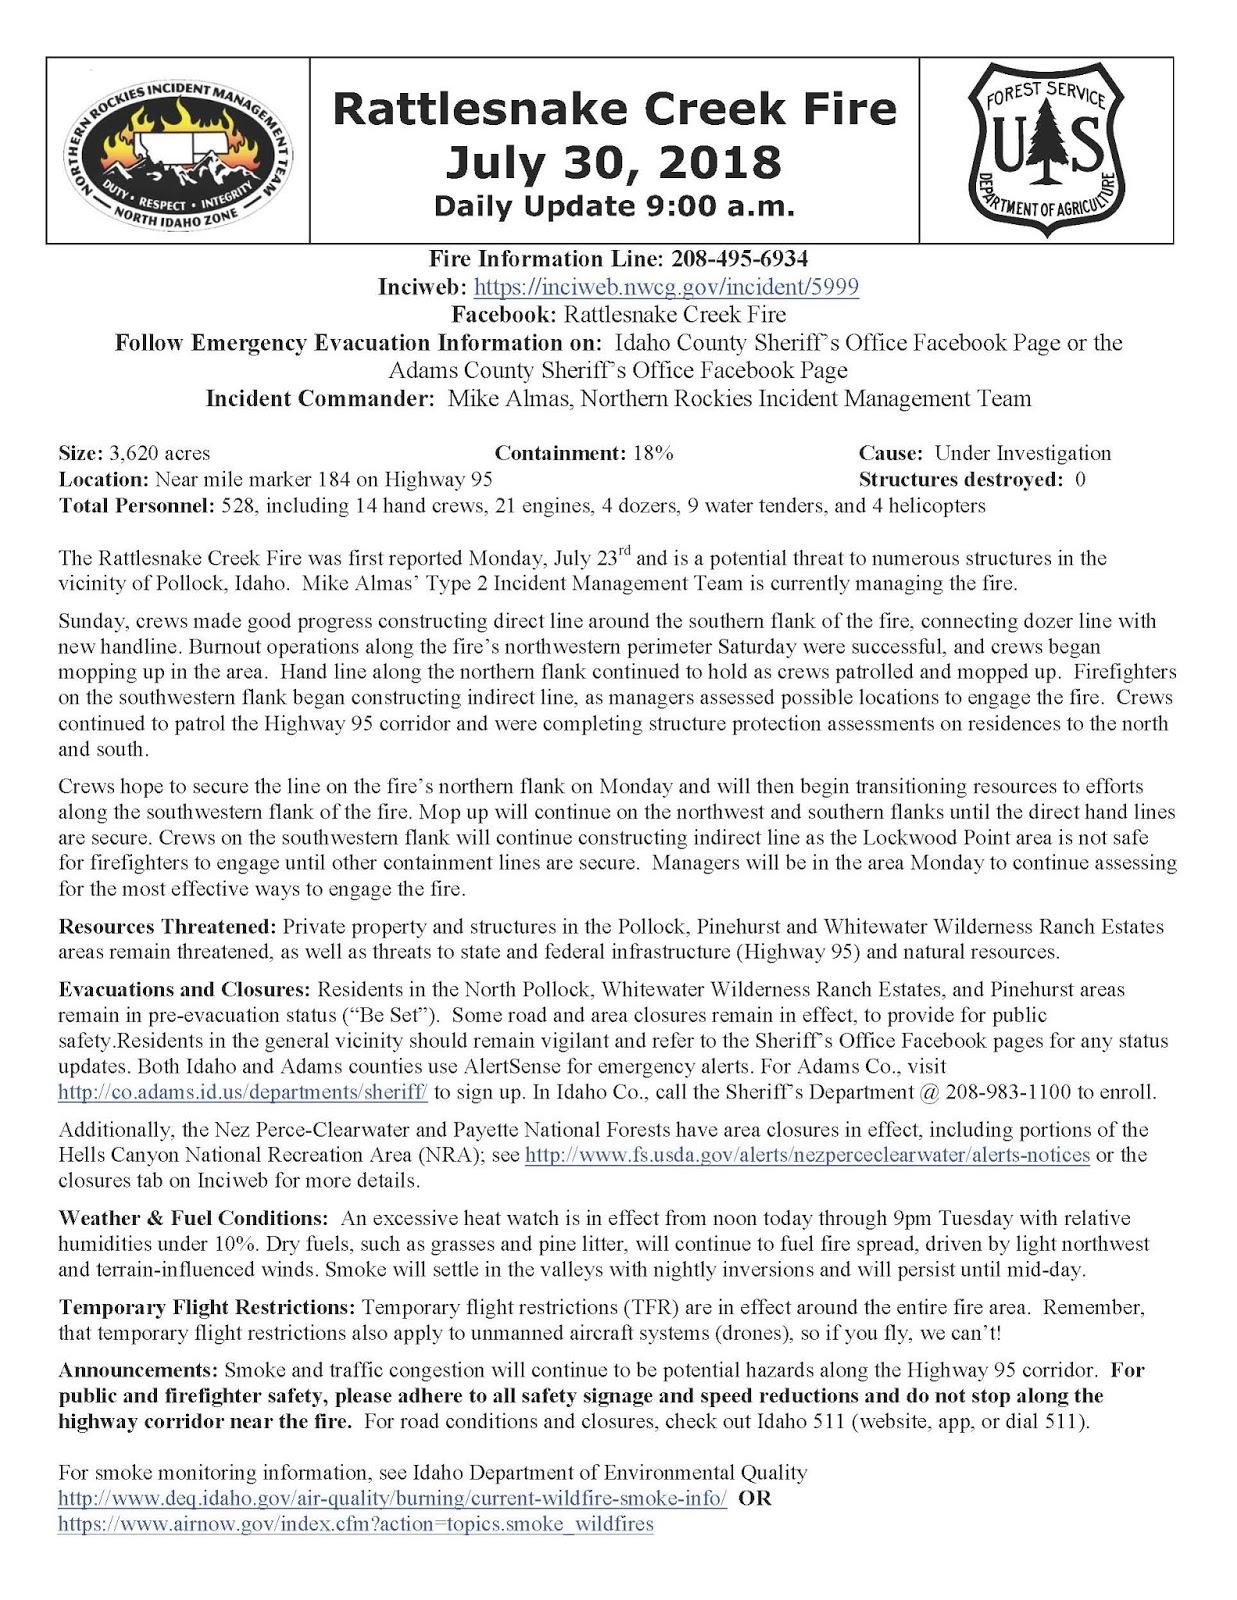 Idaho Fire Information: July 2018